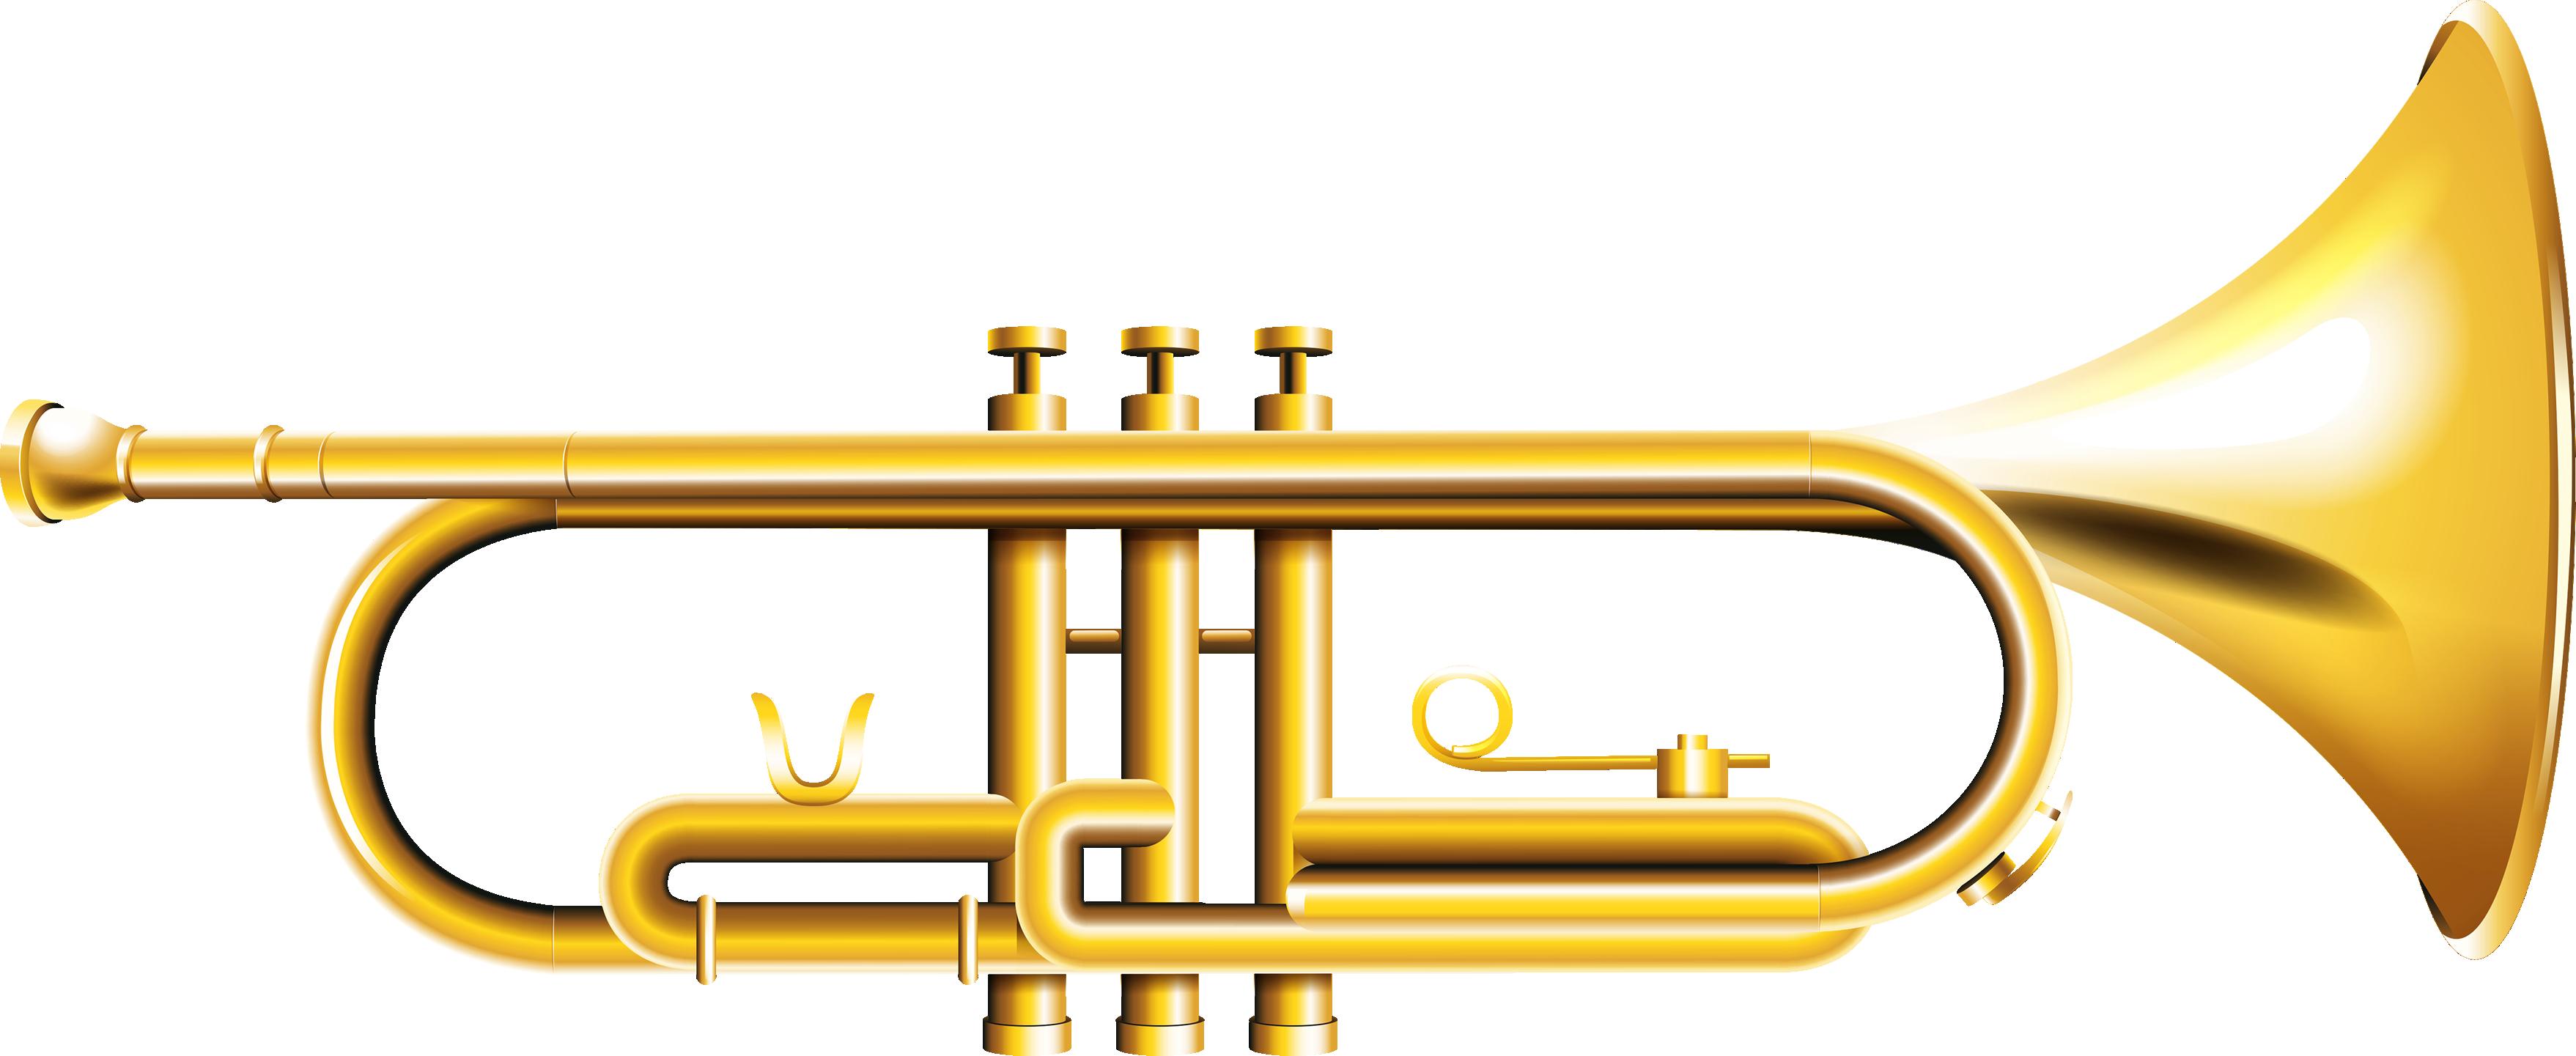 Trumpet clip art retro. Horn clipart musical intrument